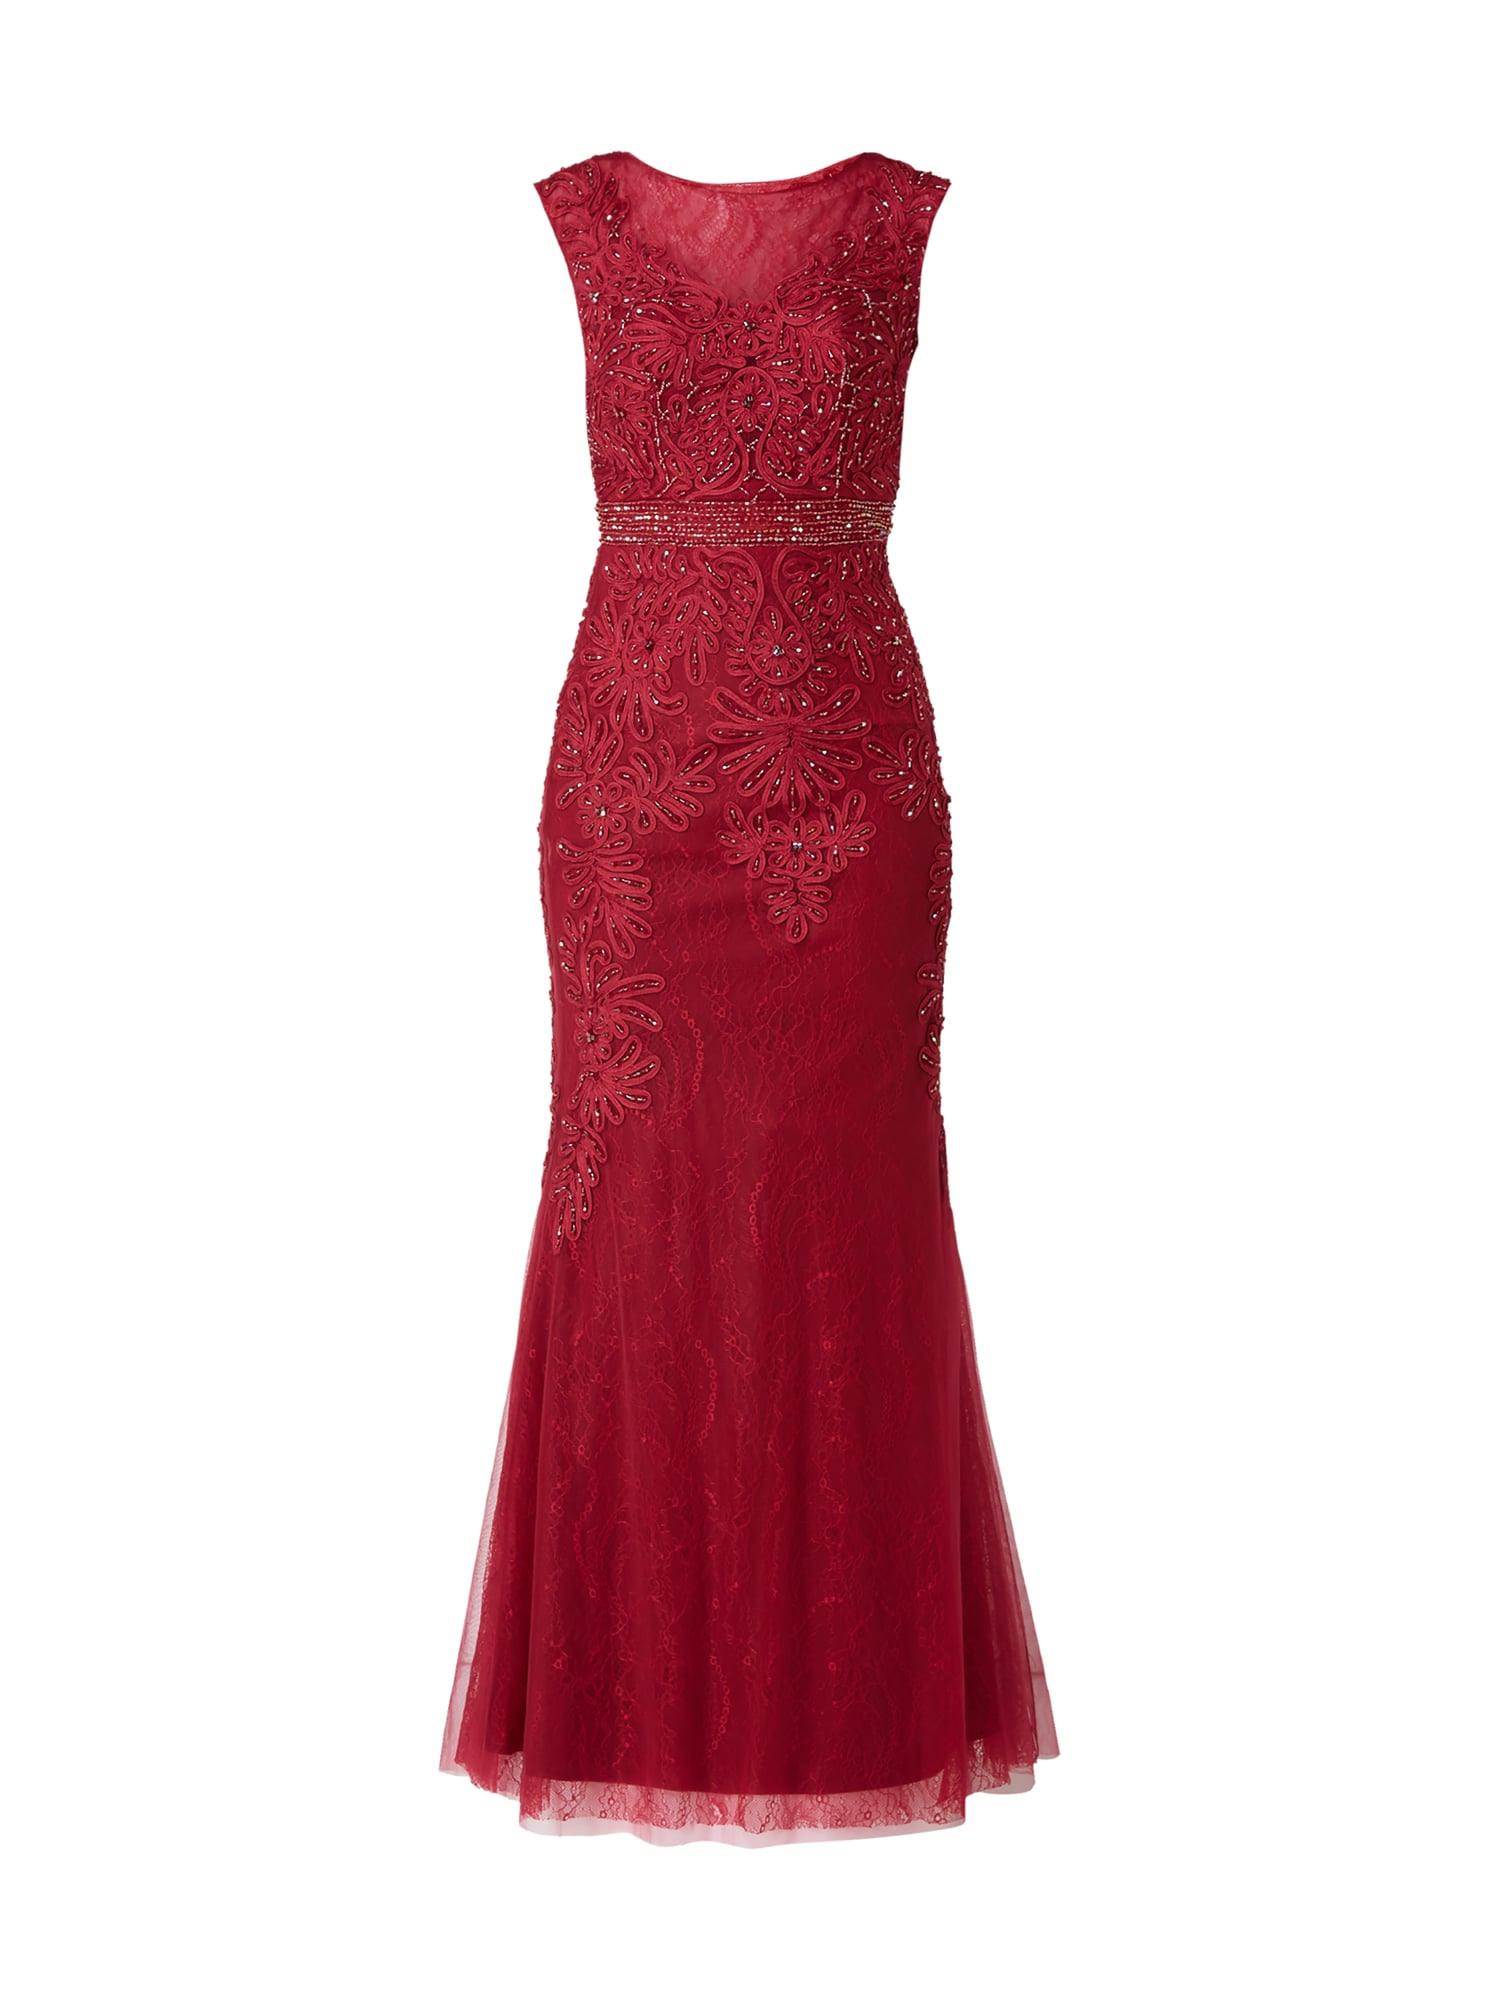 10 Perfekt Abendkleid Niente Ärmel20 Luxus Abendkleid Niente Stylish